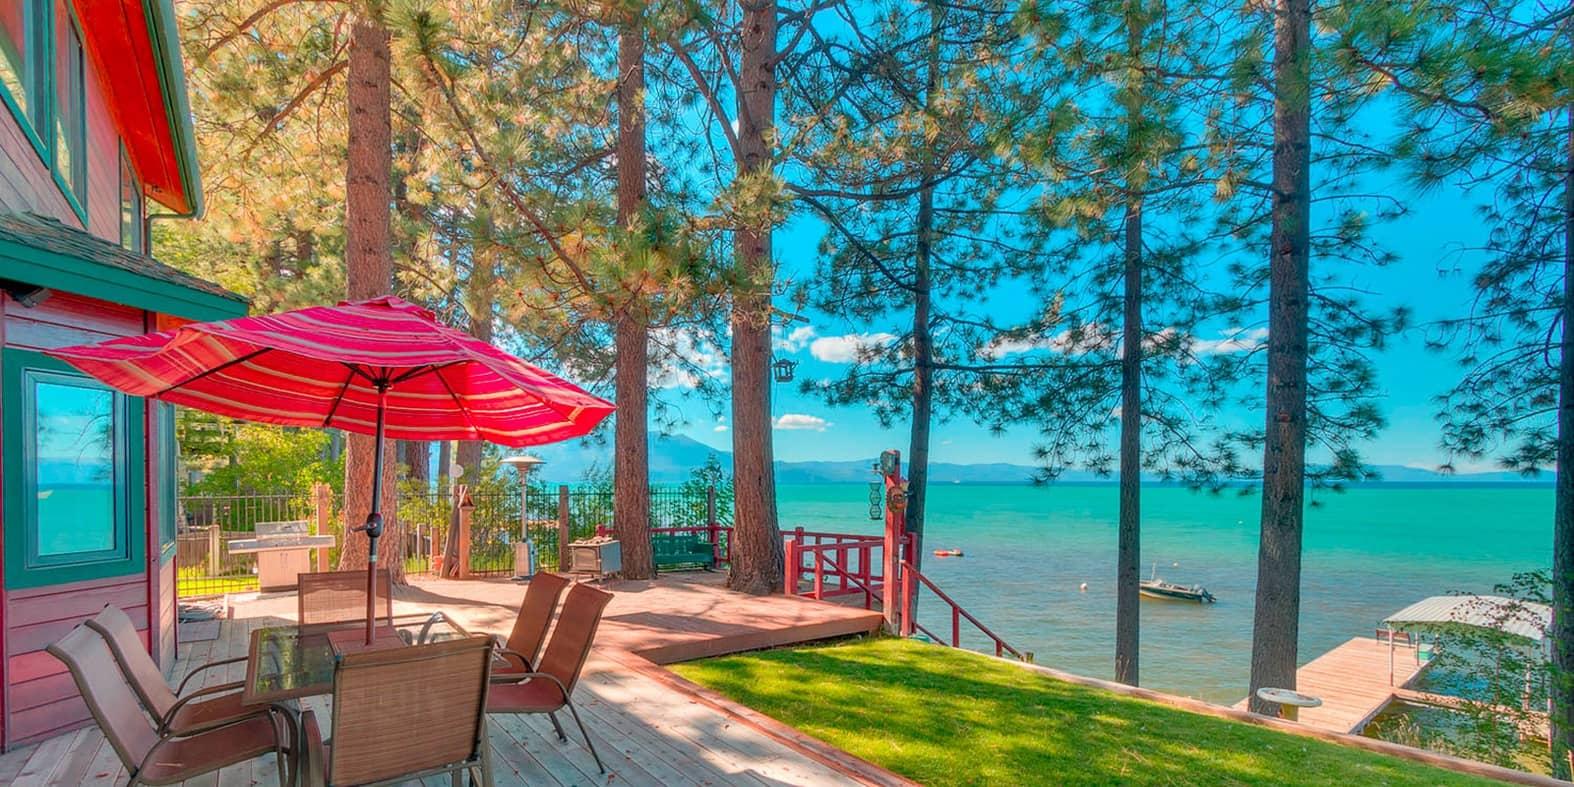 A house on the sea side of Lake Tahoe